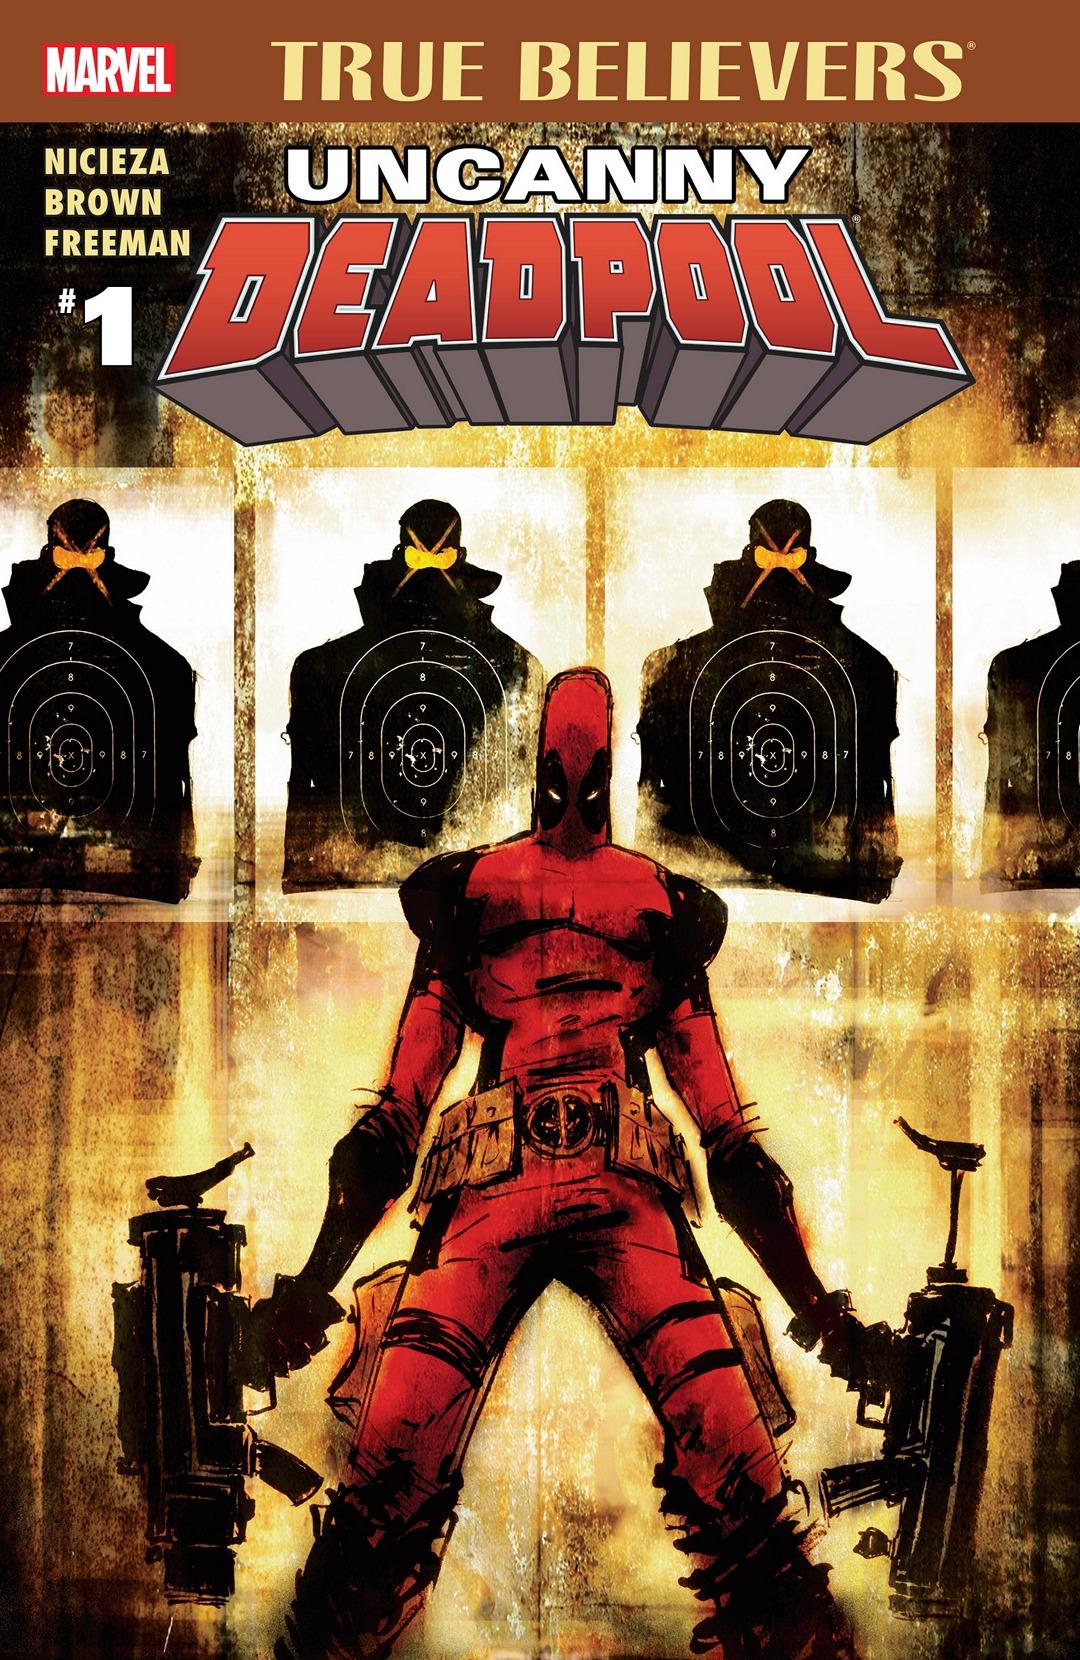 True Believers: Uncanny Deadpool Vol 1 1